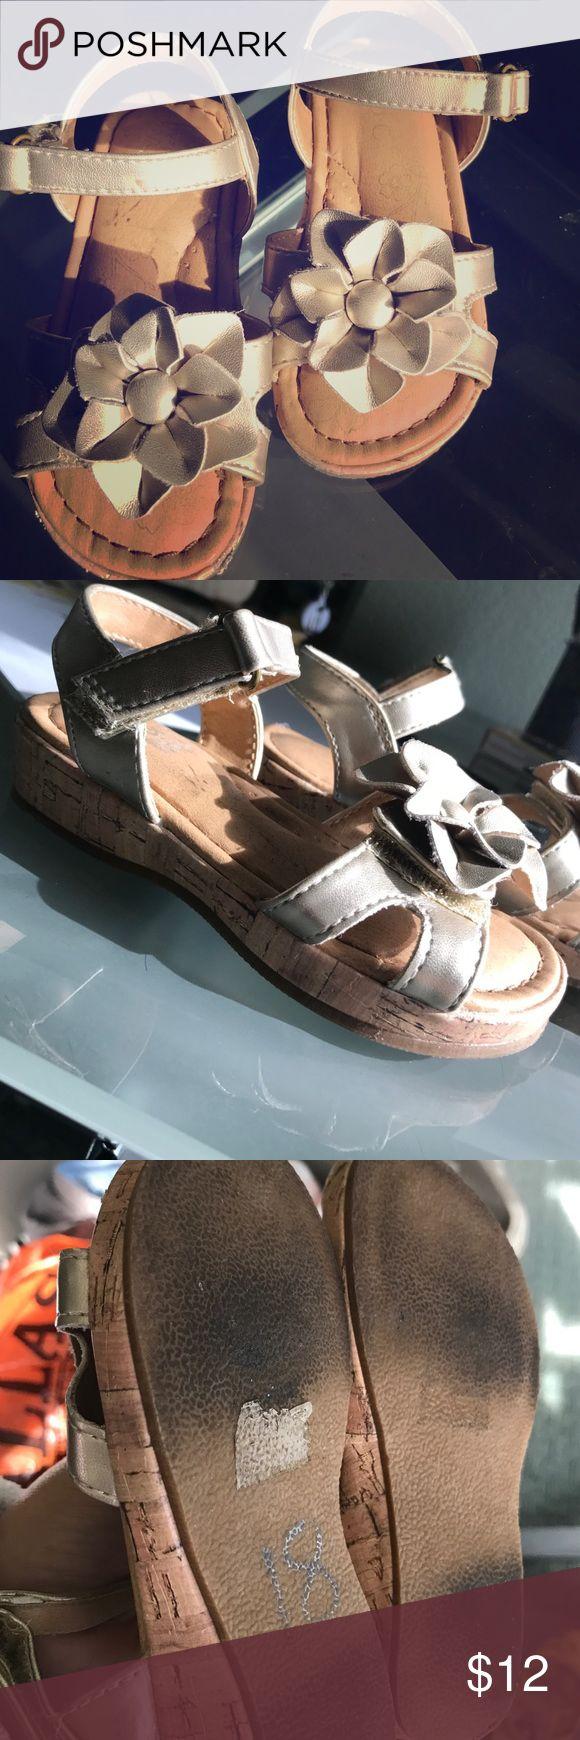 Toddler sandals Super cute! Good quality! Not cheap!❤️ fast shipment!📦 Shoes Sandals & Flip Flops